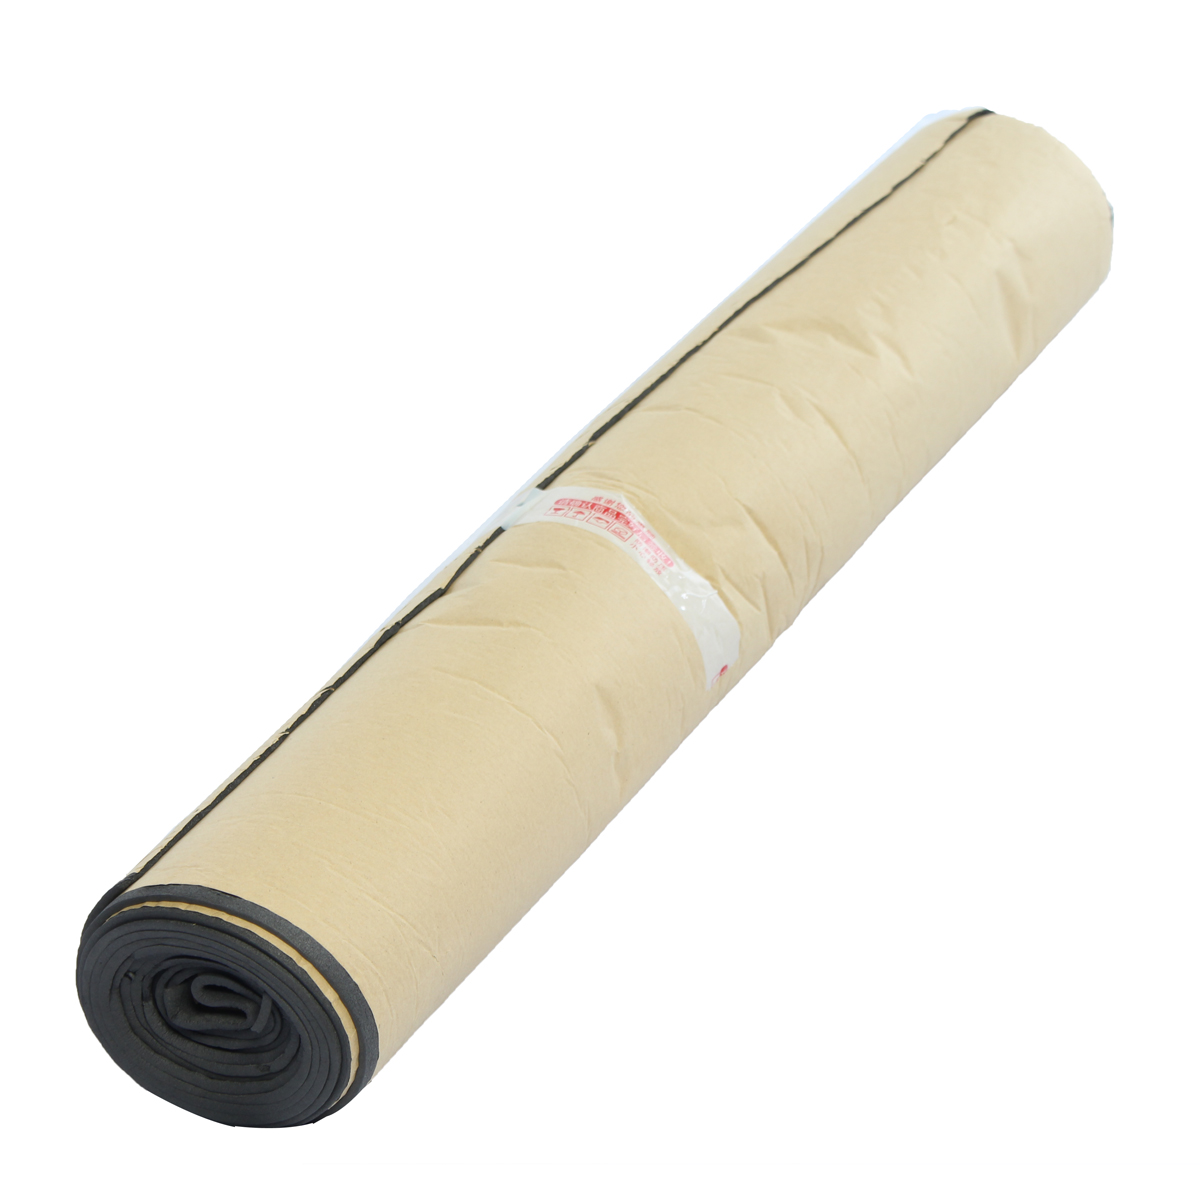 36 sqft Car Sound Deadening Mat Sound Deadener Insulation Acoustic Foam Material Interior Accessory Sound Heat Insulation Cotton